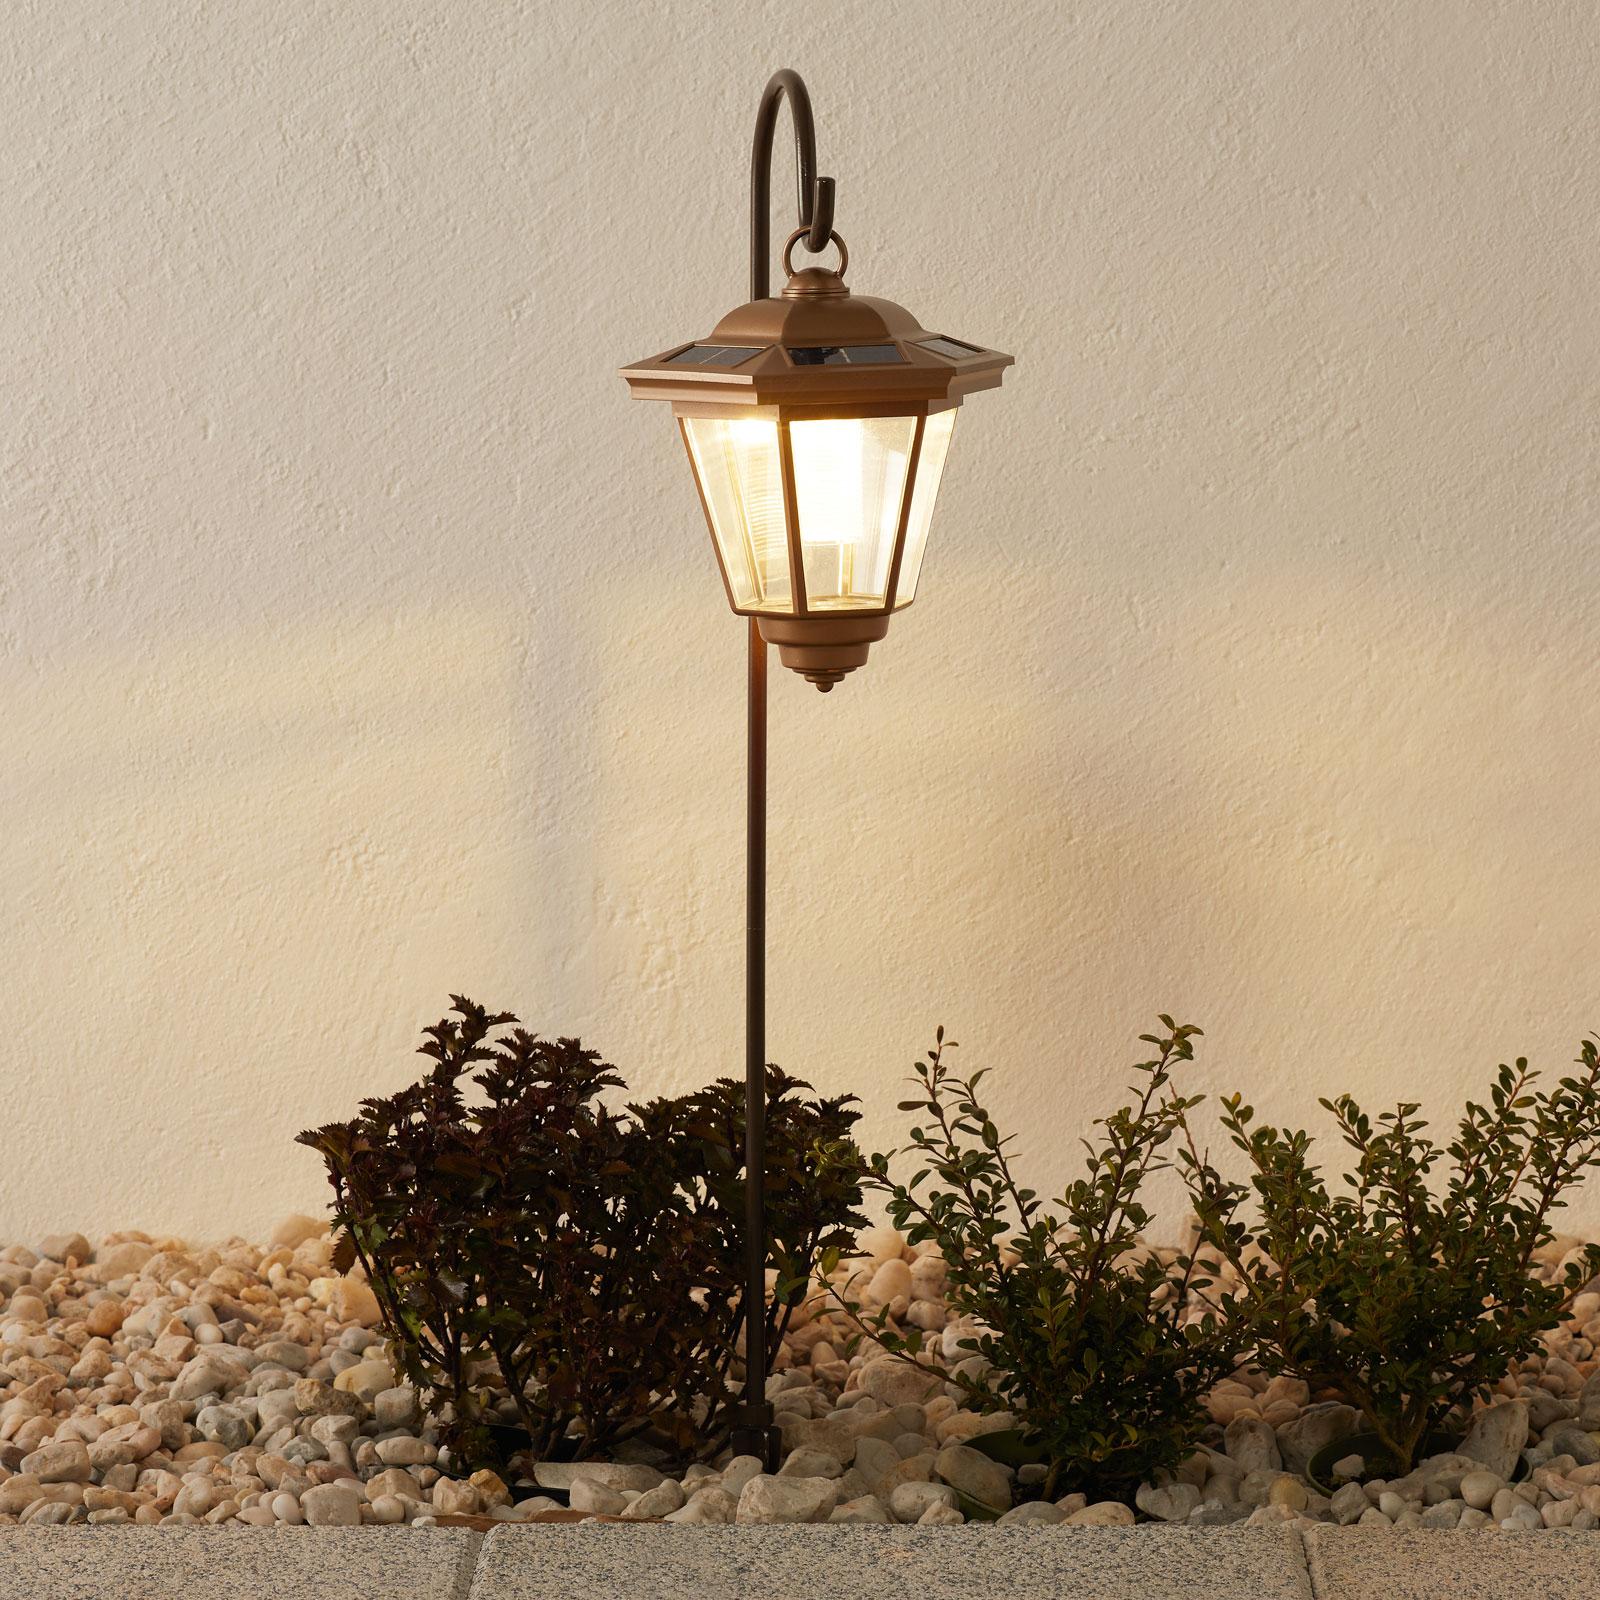 Led-hanglamp TIVOLI, op zonne-energie